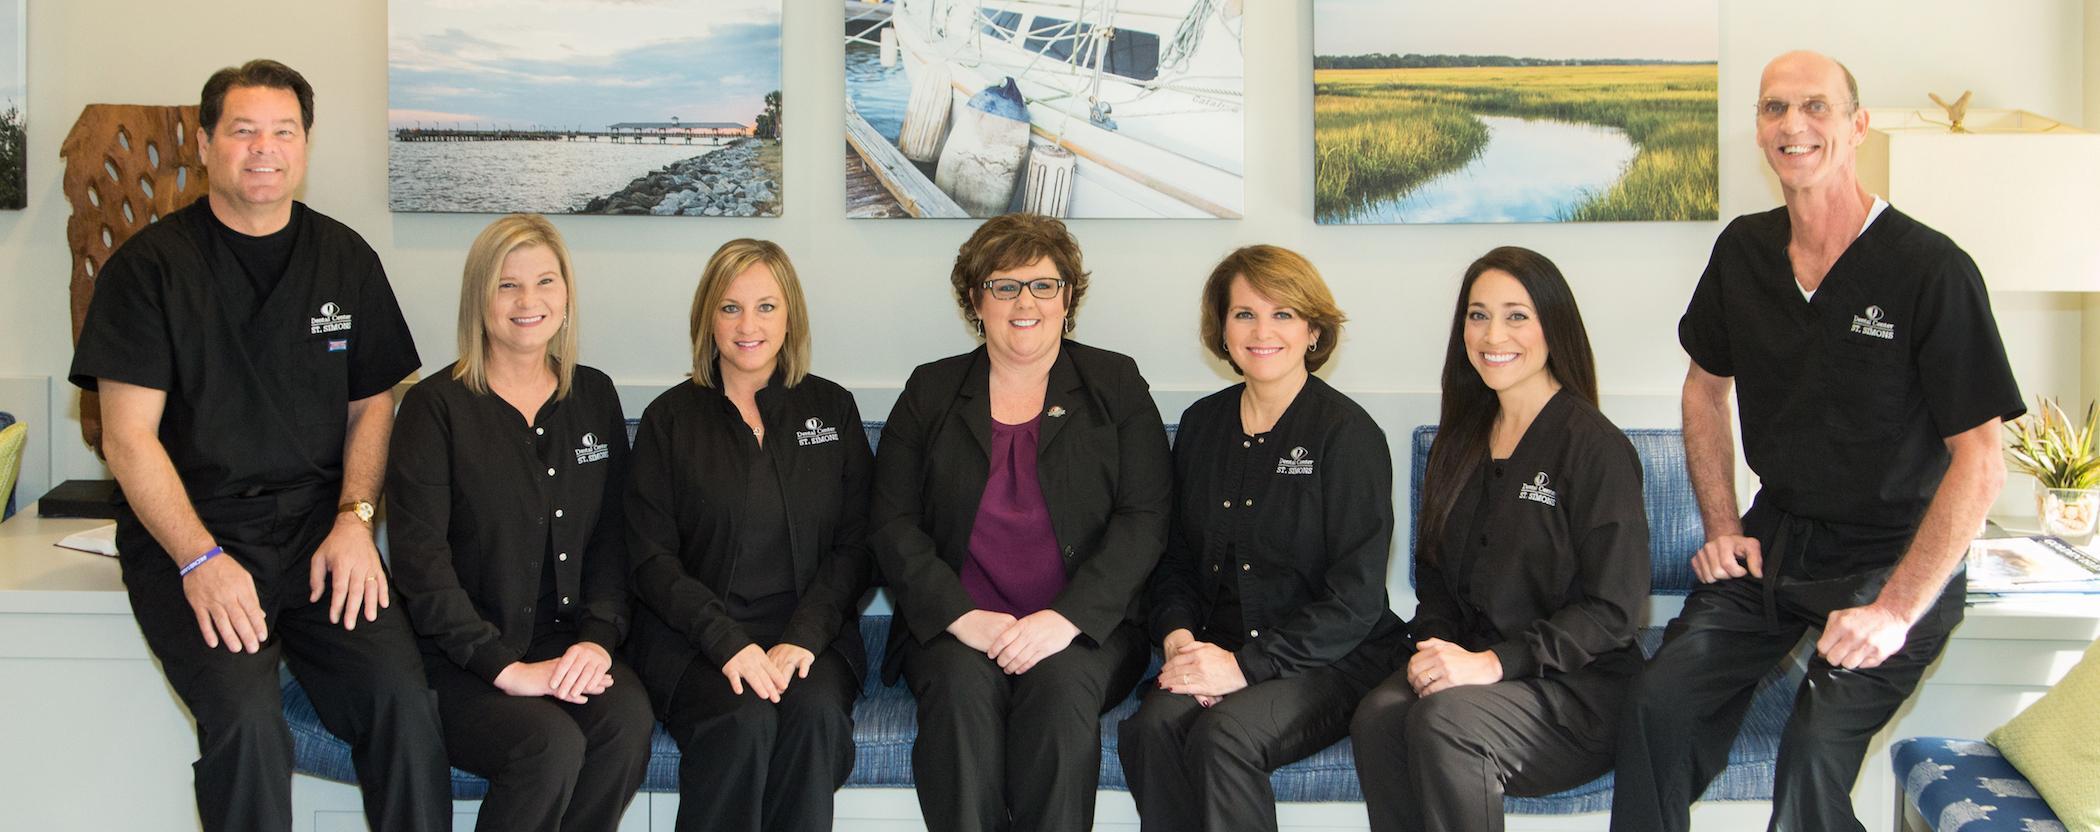 St. Simons Dental Services